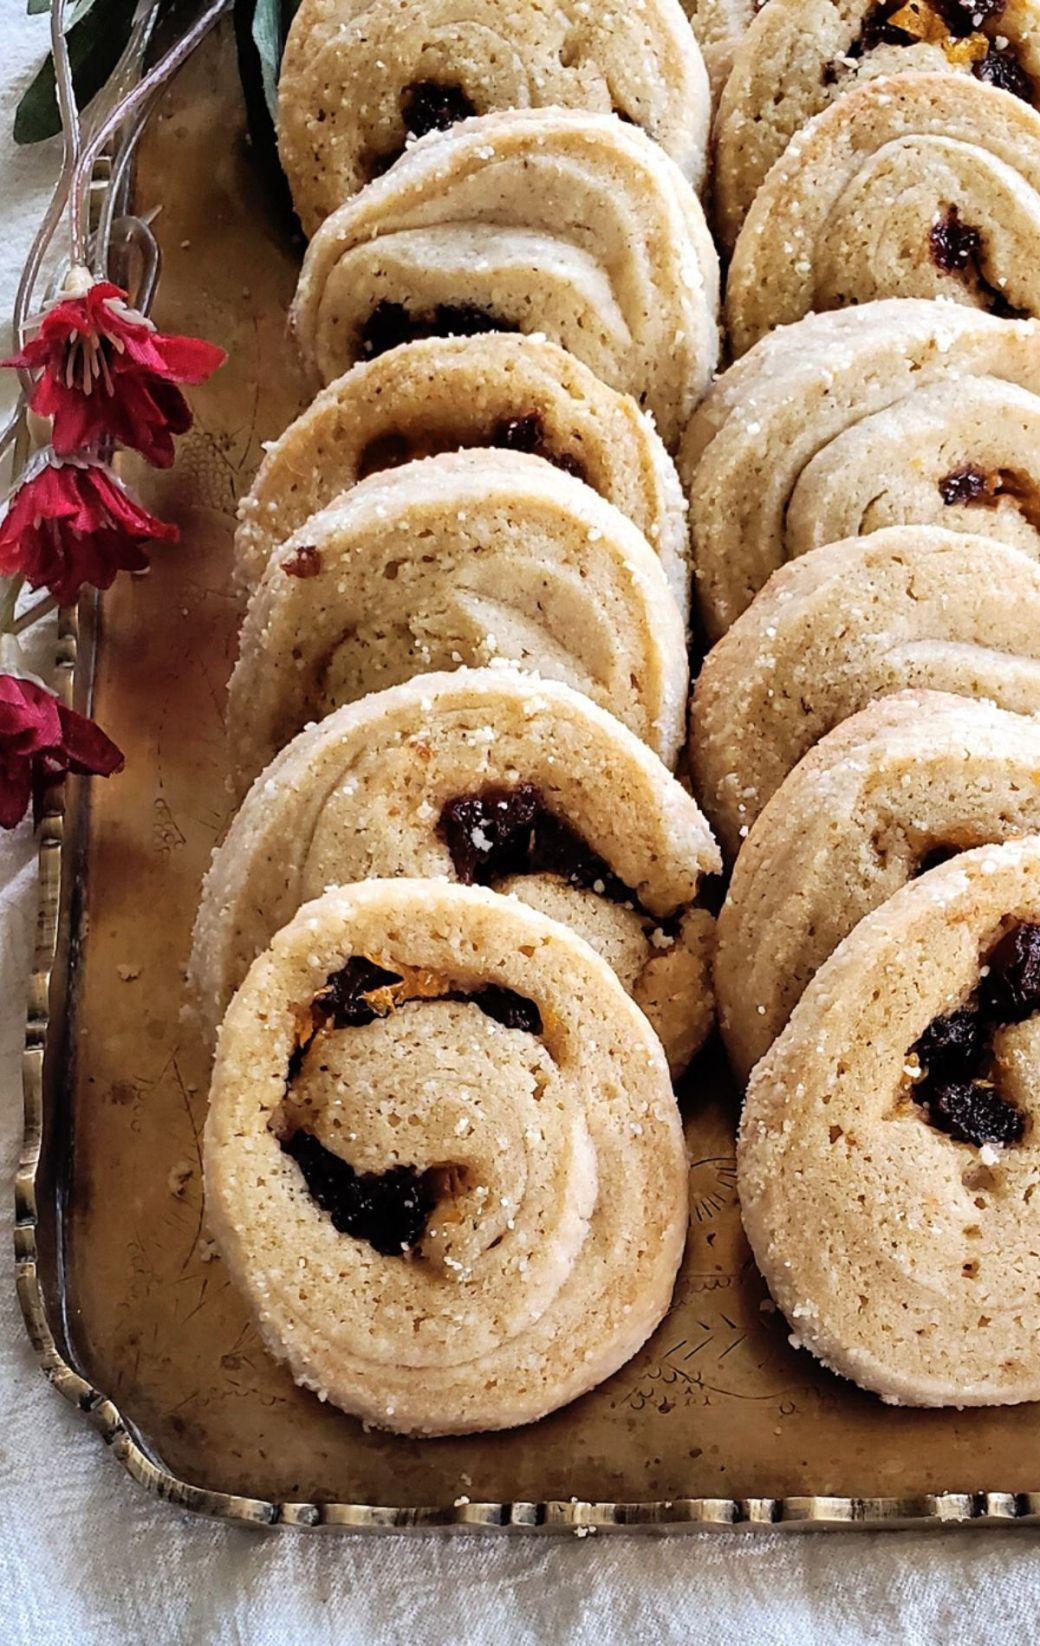 Spiced Raisin Swirl Shortbread Cookies